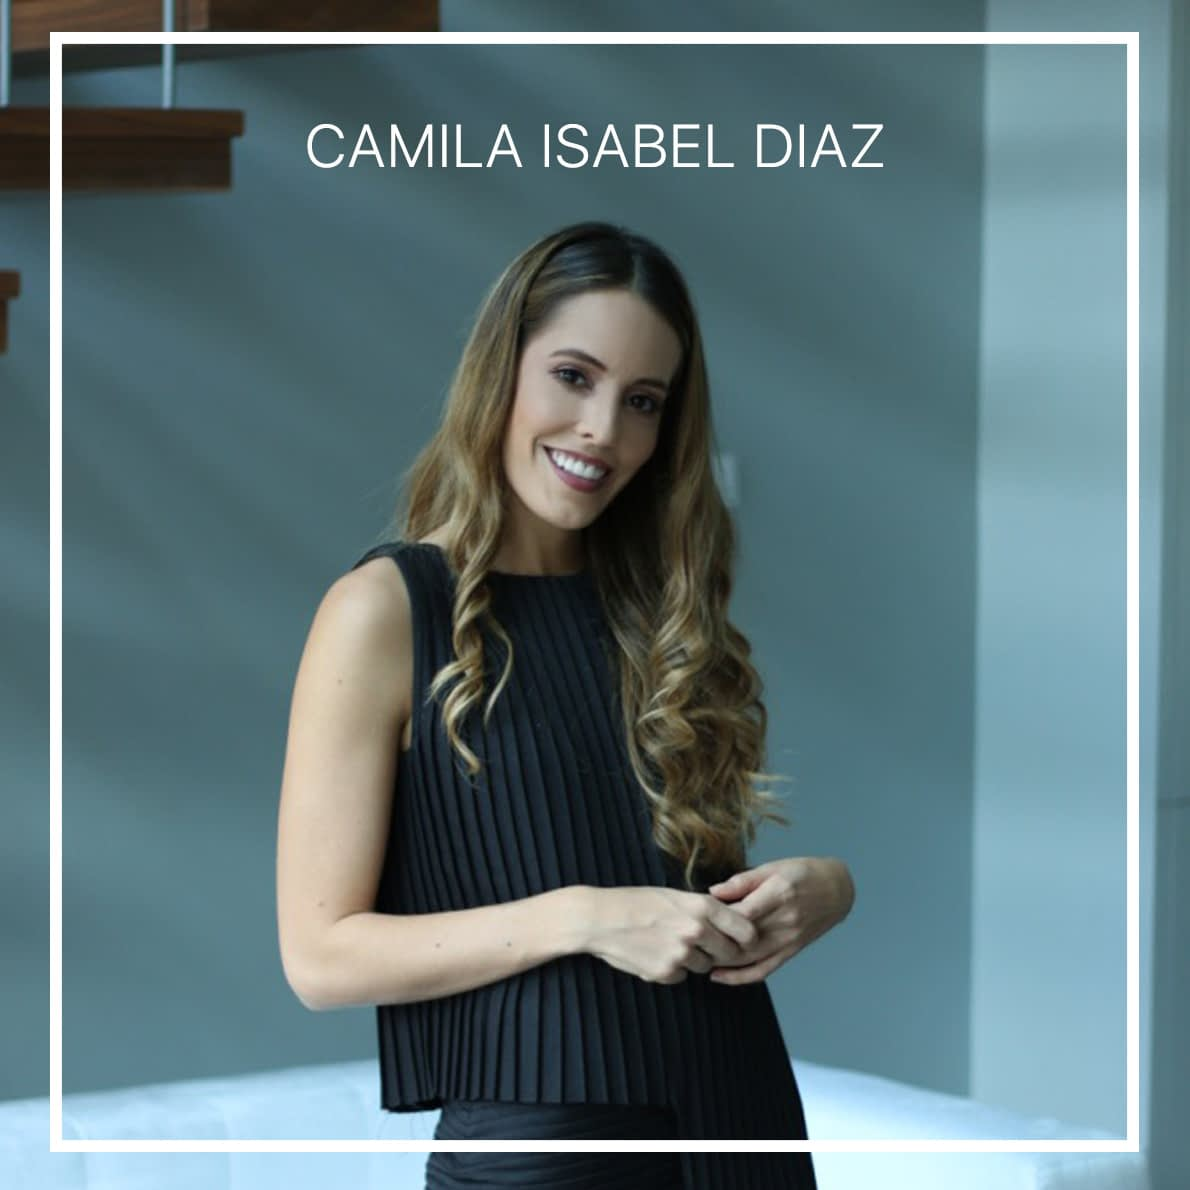 Camila Isabel Diaz